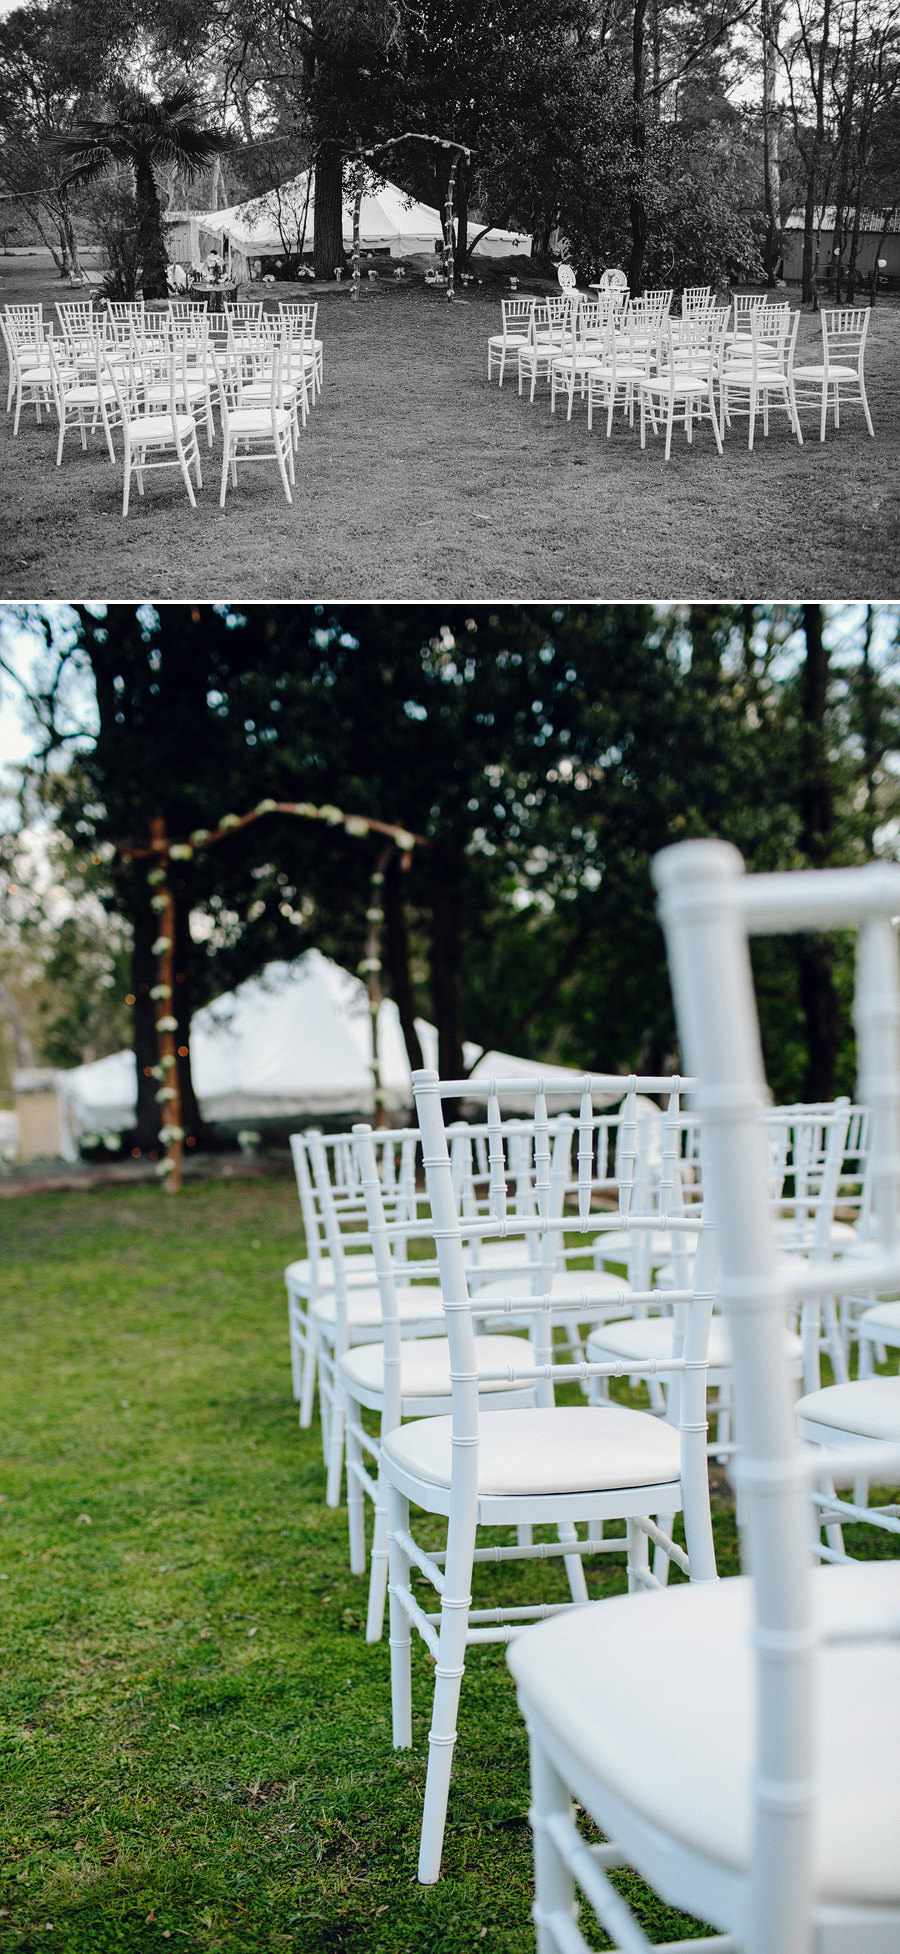 Sackville Wedding Photography: Ceremony details